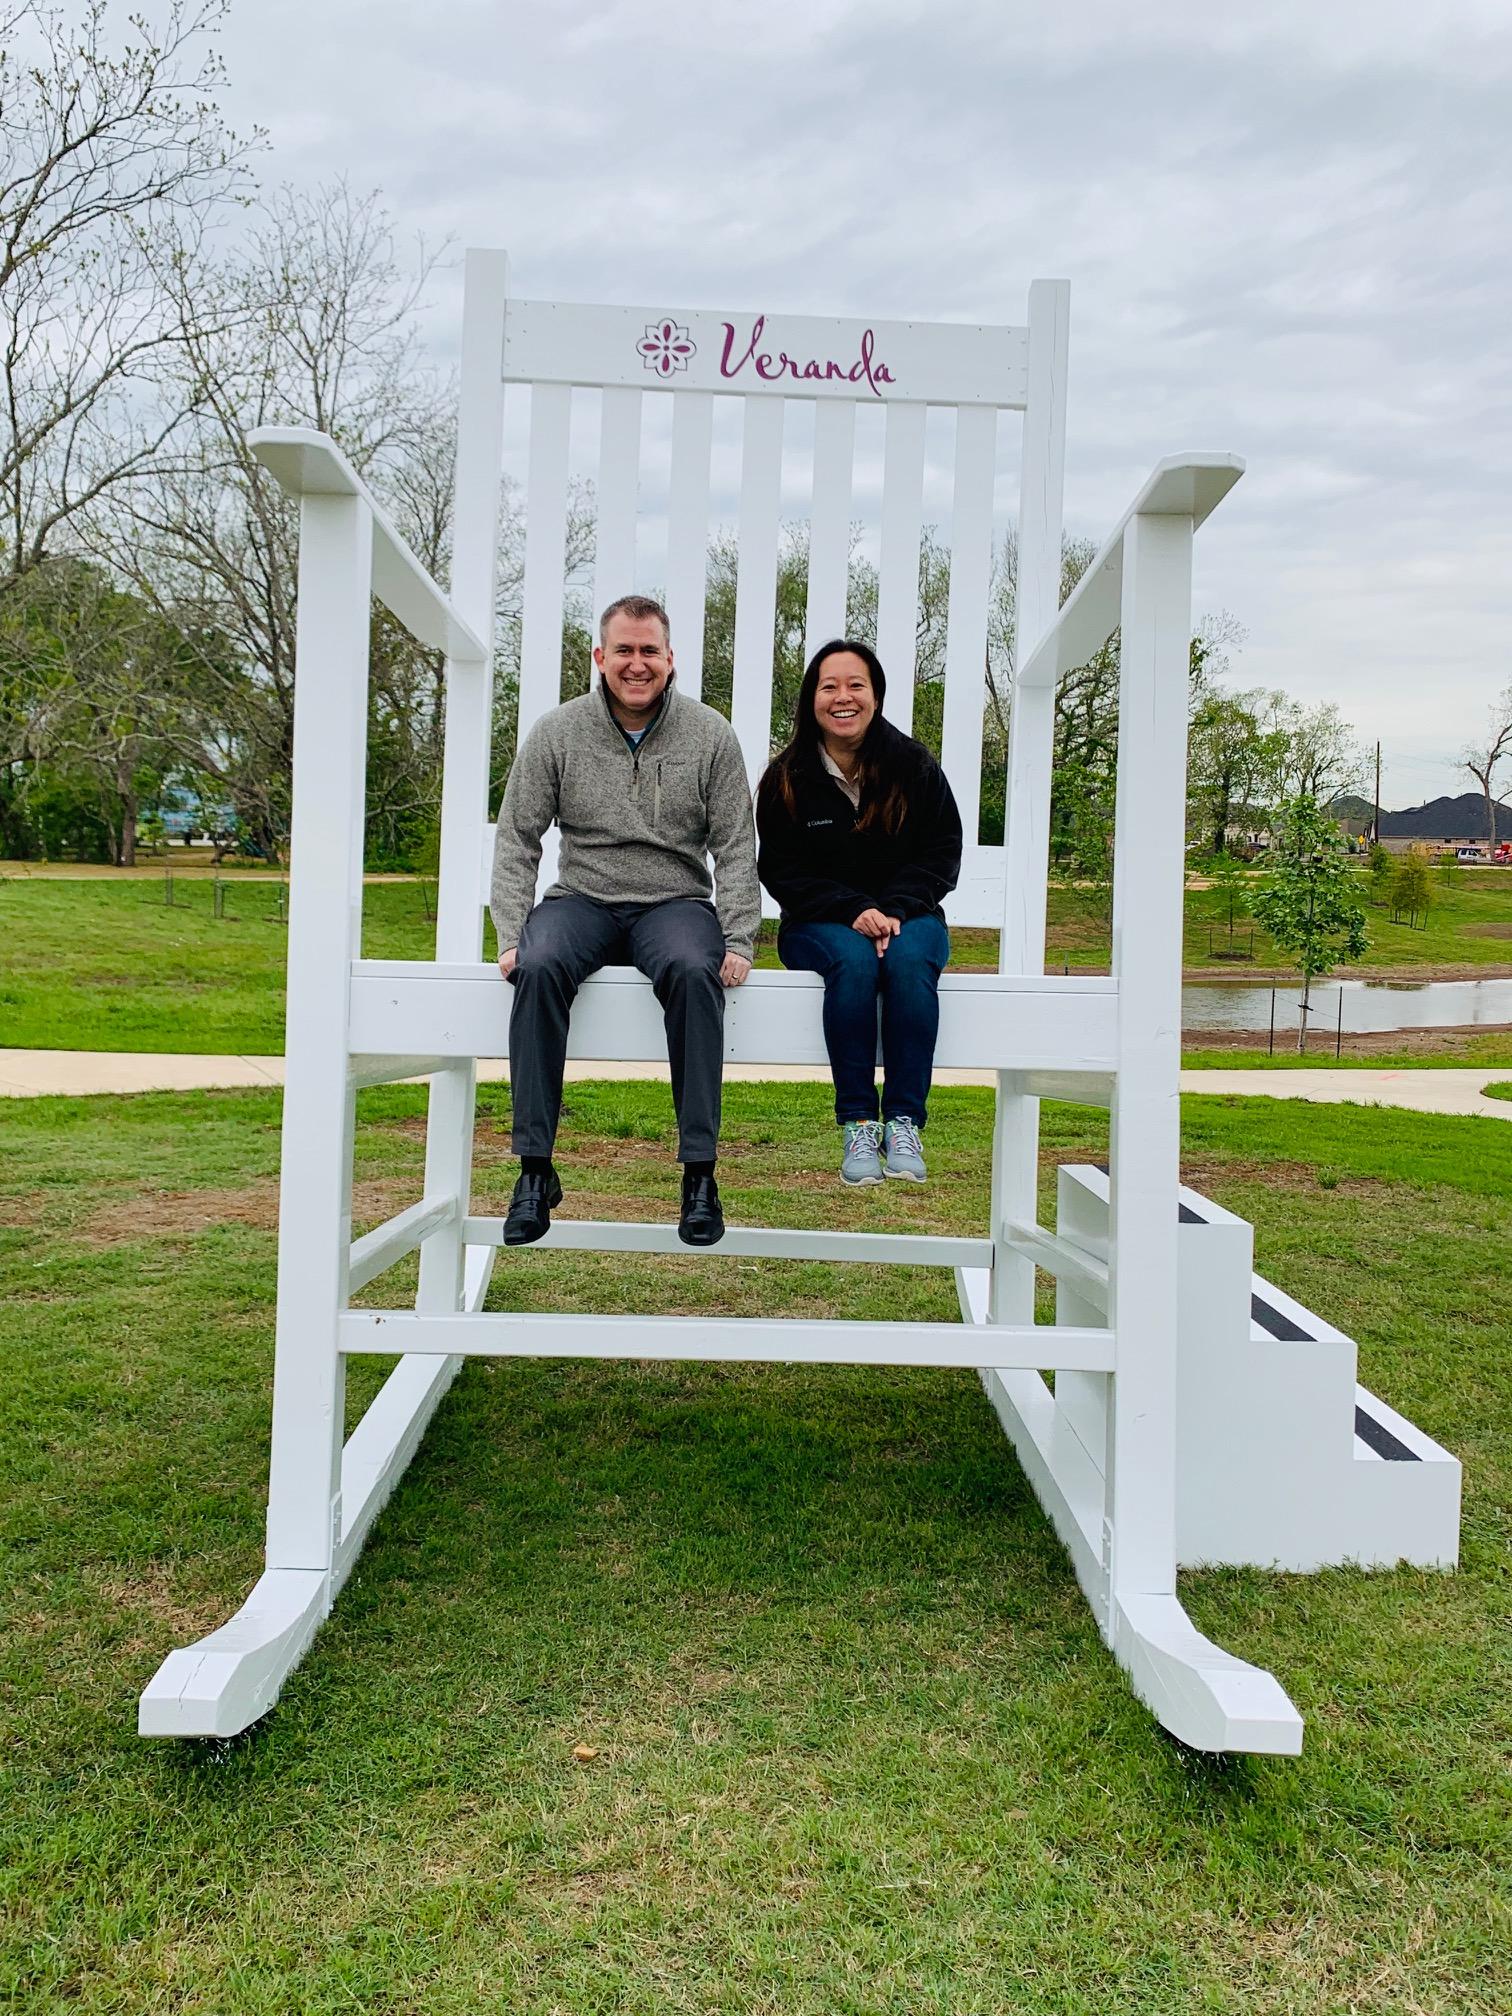 Giant Rocking Chair in Richmond, TX